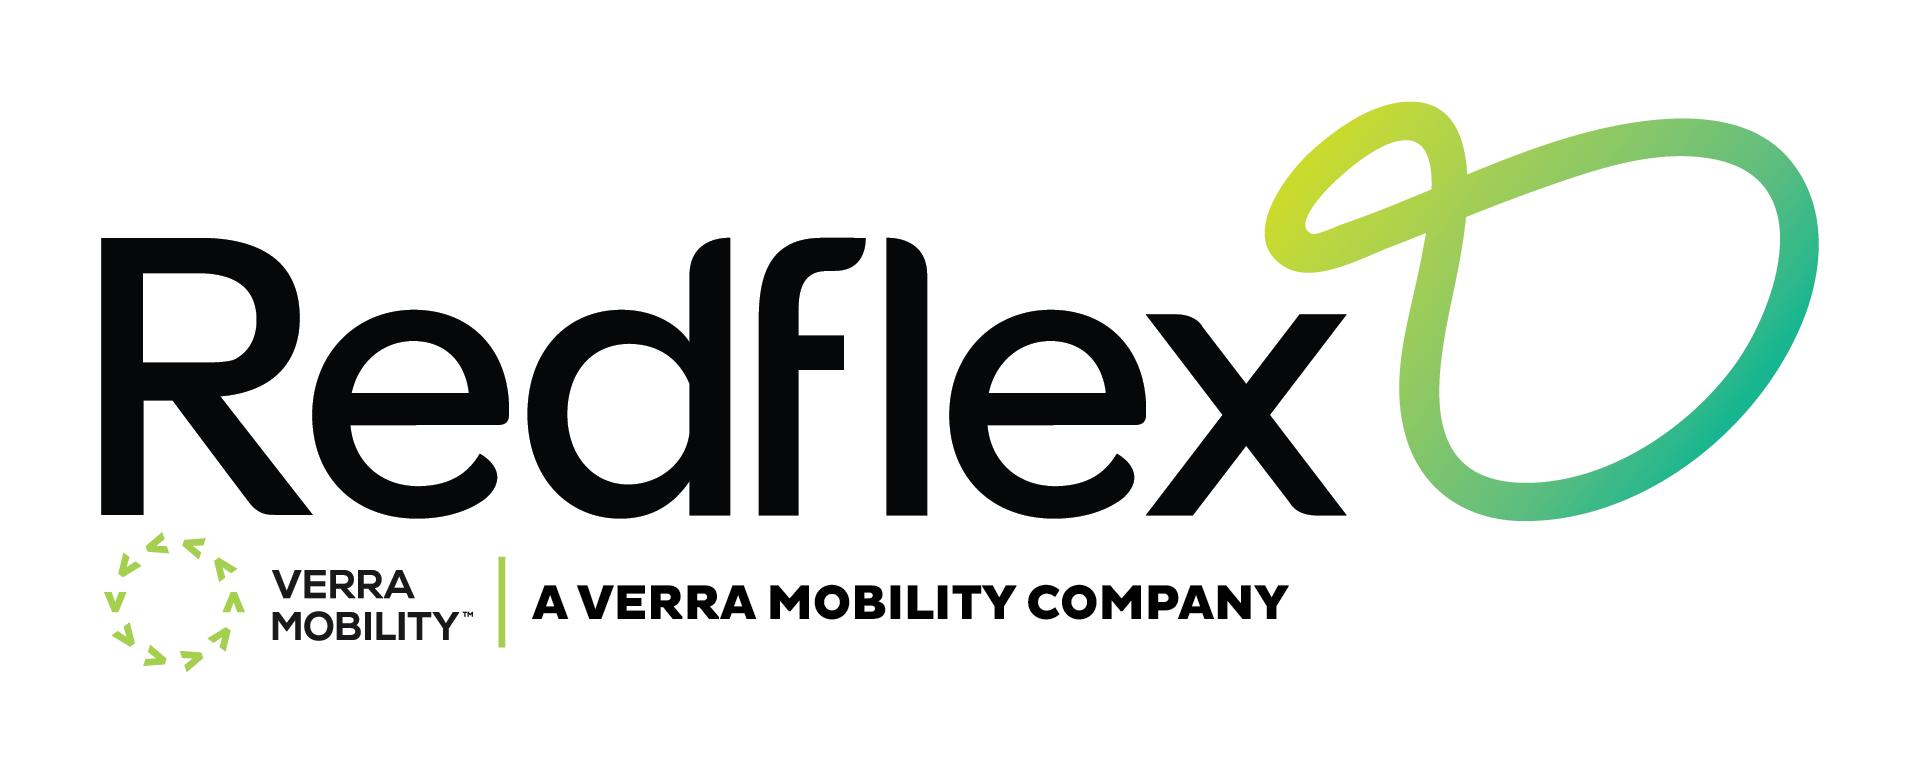 Redflex Group